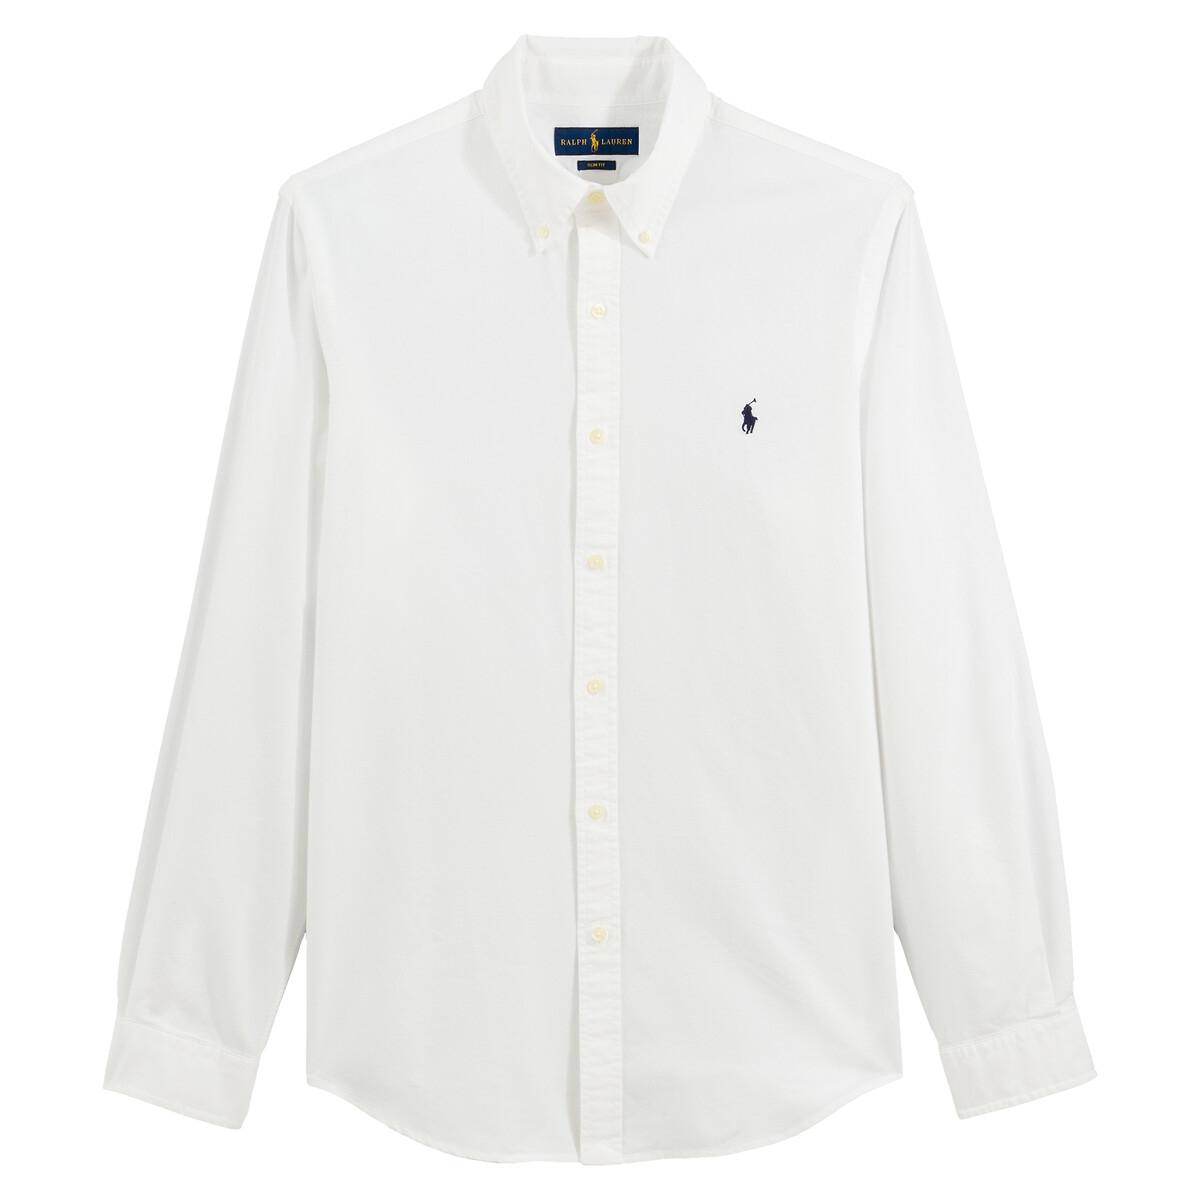 цена Рубашка La Redoute Узкого покроя из ткани оксфорд L белый онлайн в 2017 году